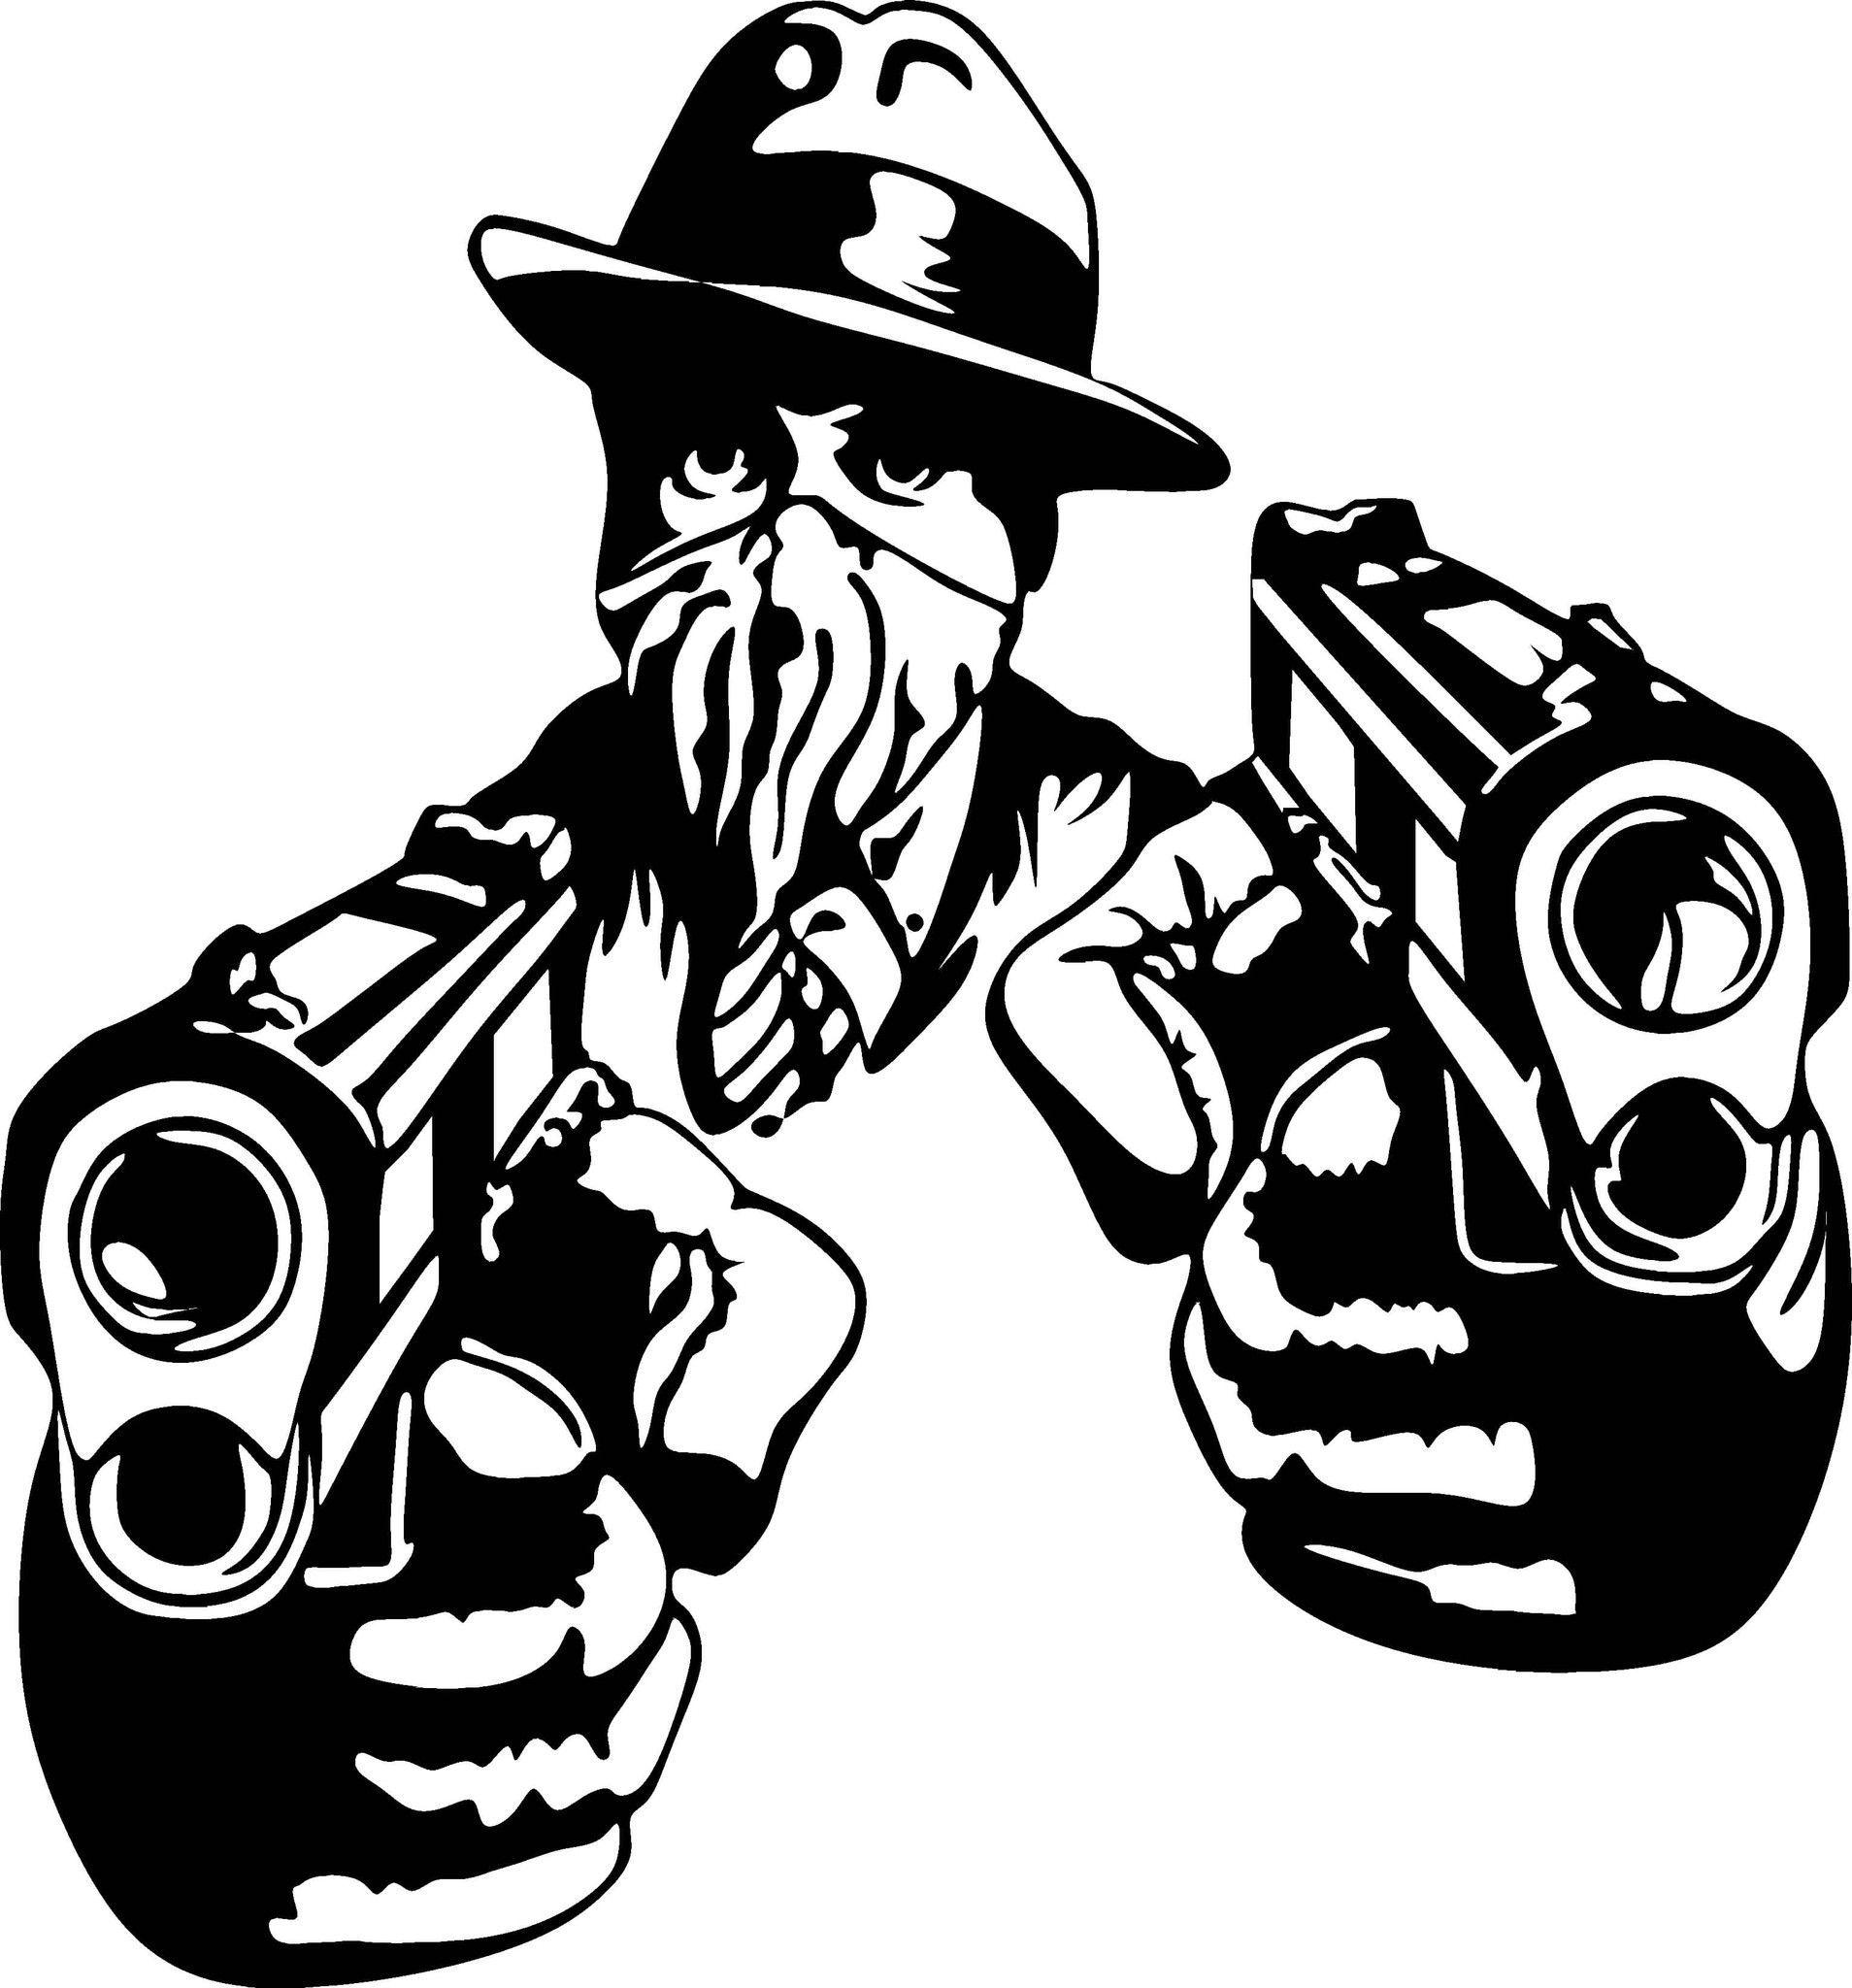 gangster al capone vinyl decal graphic choose your color and size rh pinterest com Robert De Niro Baseball Bat Untouchables Baseball Bat